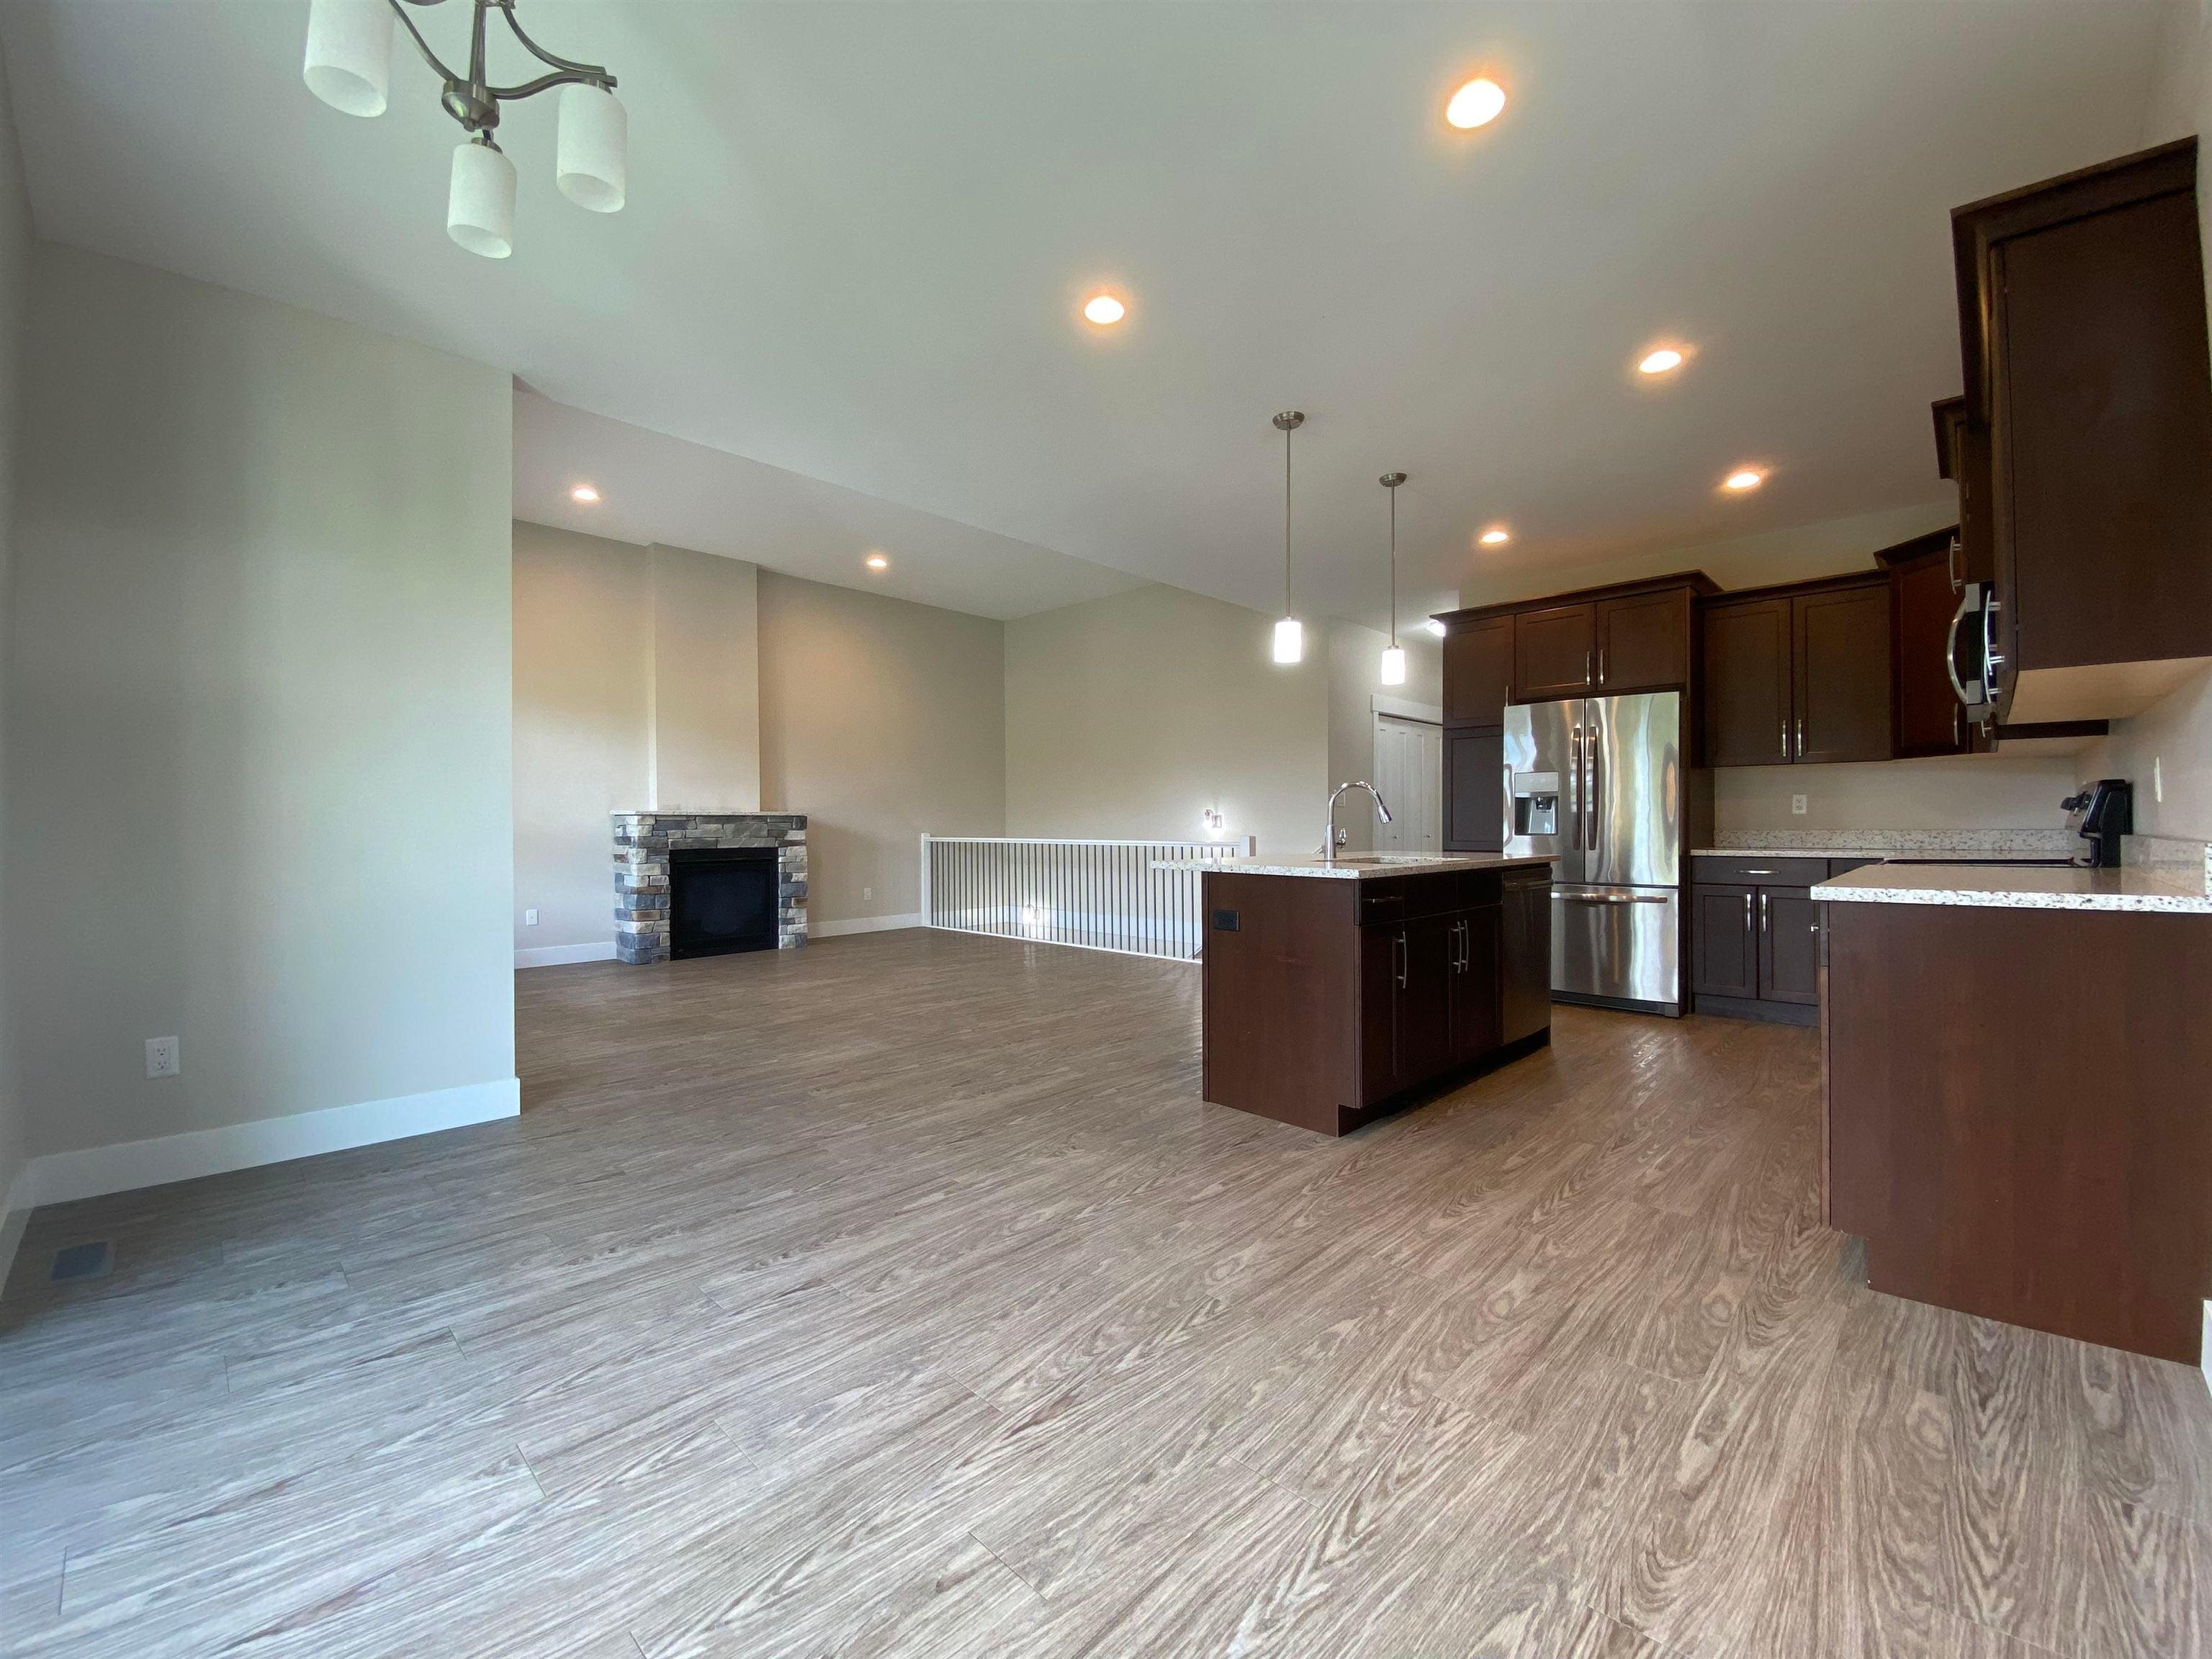 10144 KILLARNEY DRIVE - Fairfield Island House/Single Family for sale, 5 Bedrooms (R2625716) - #13